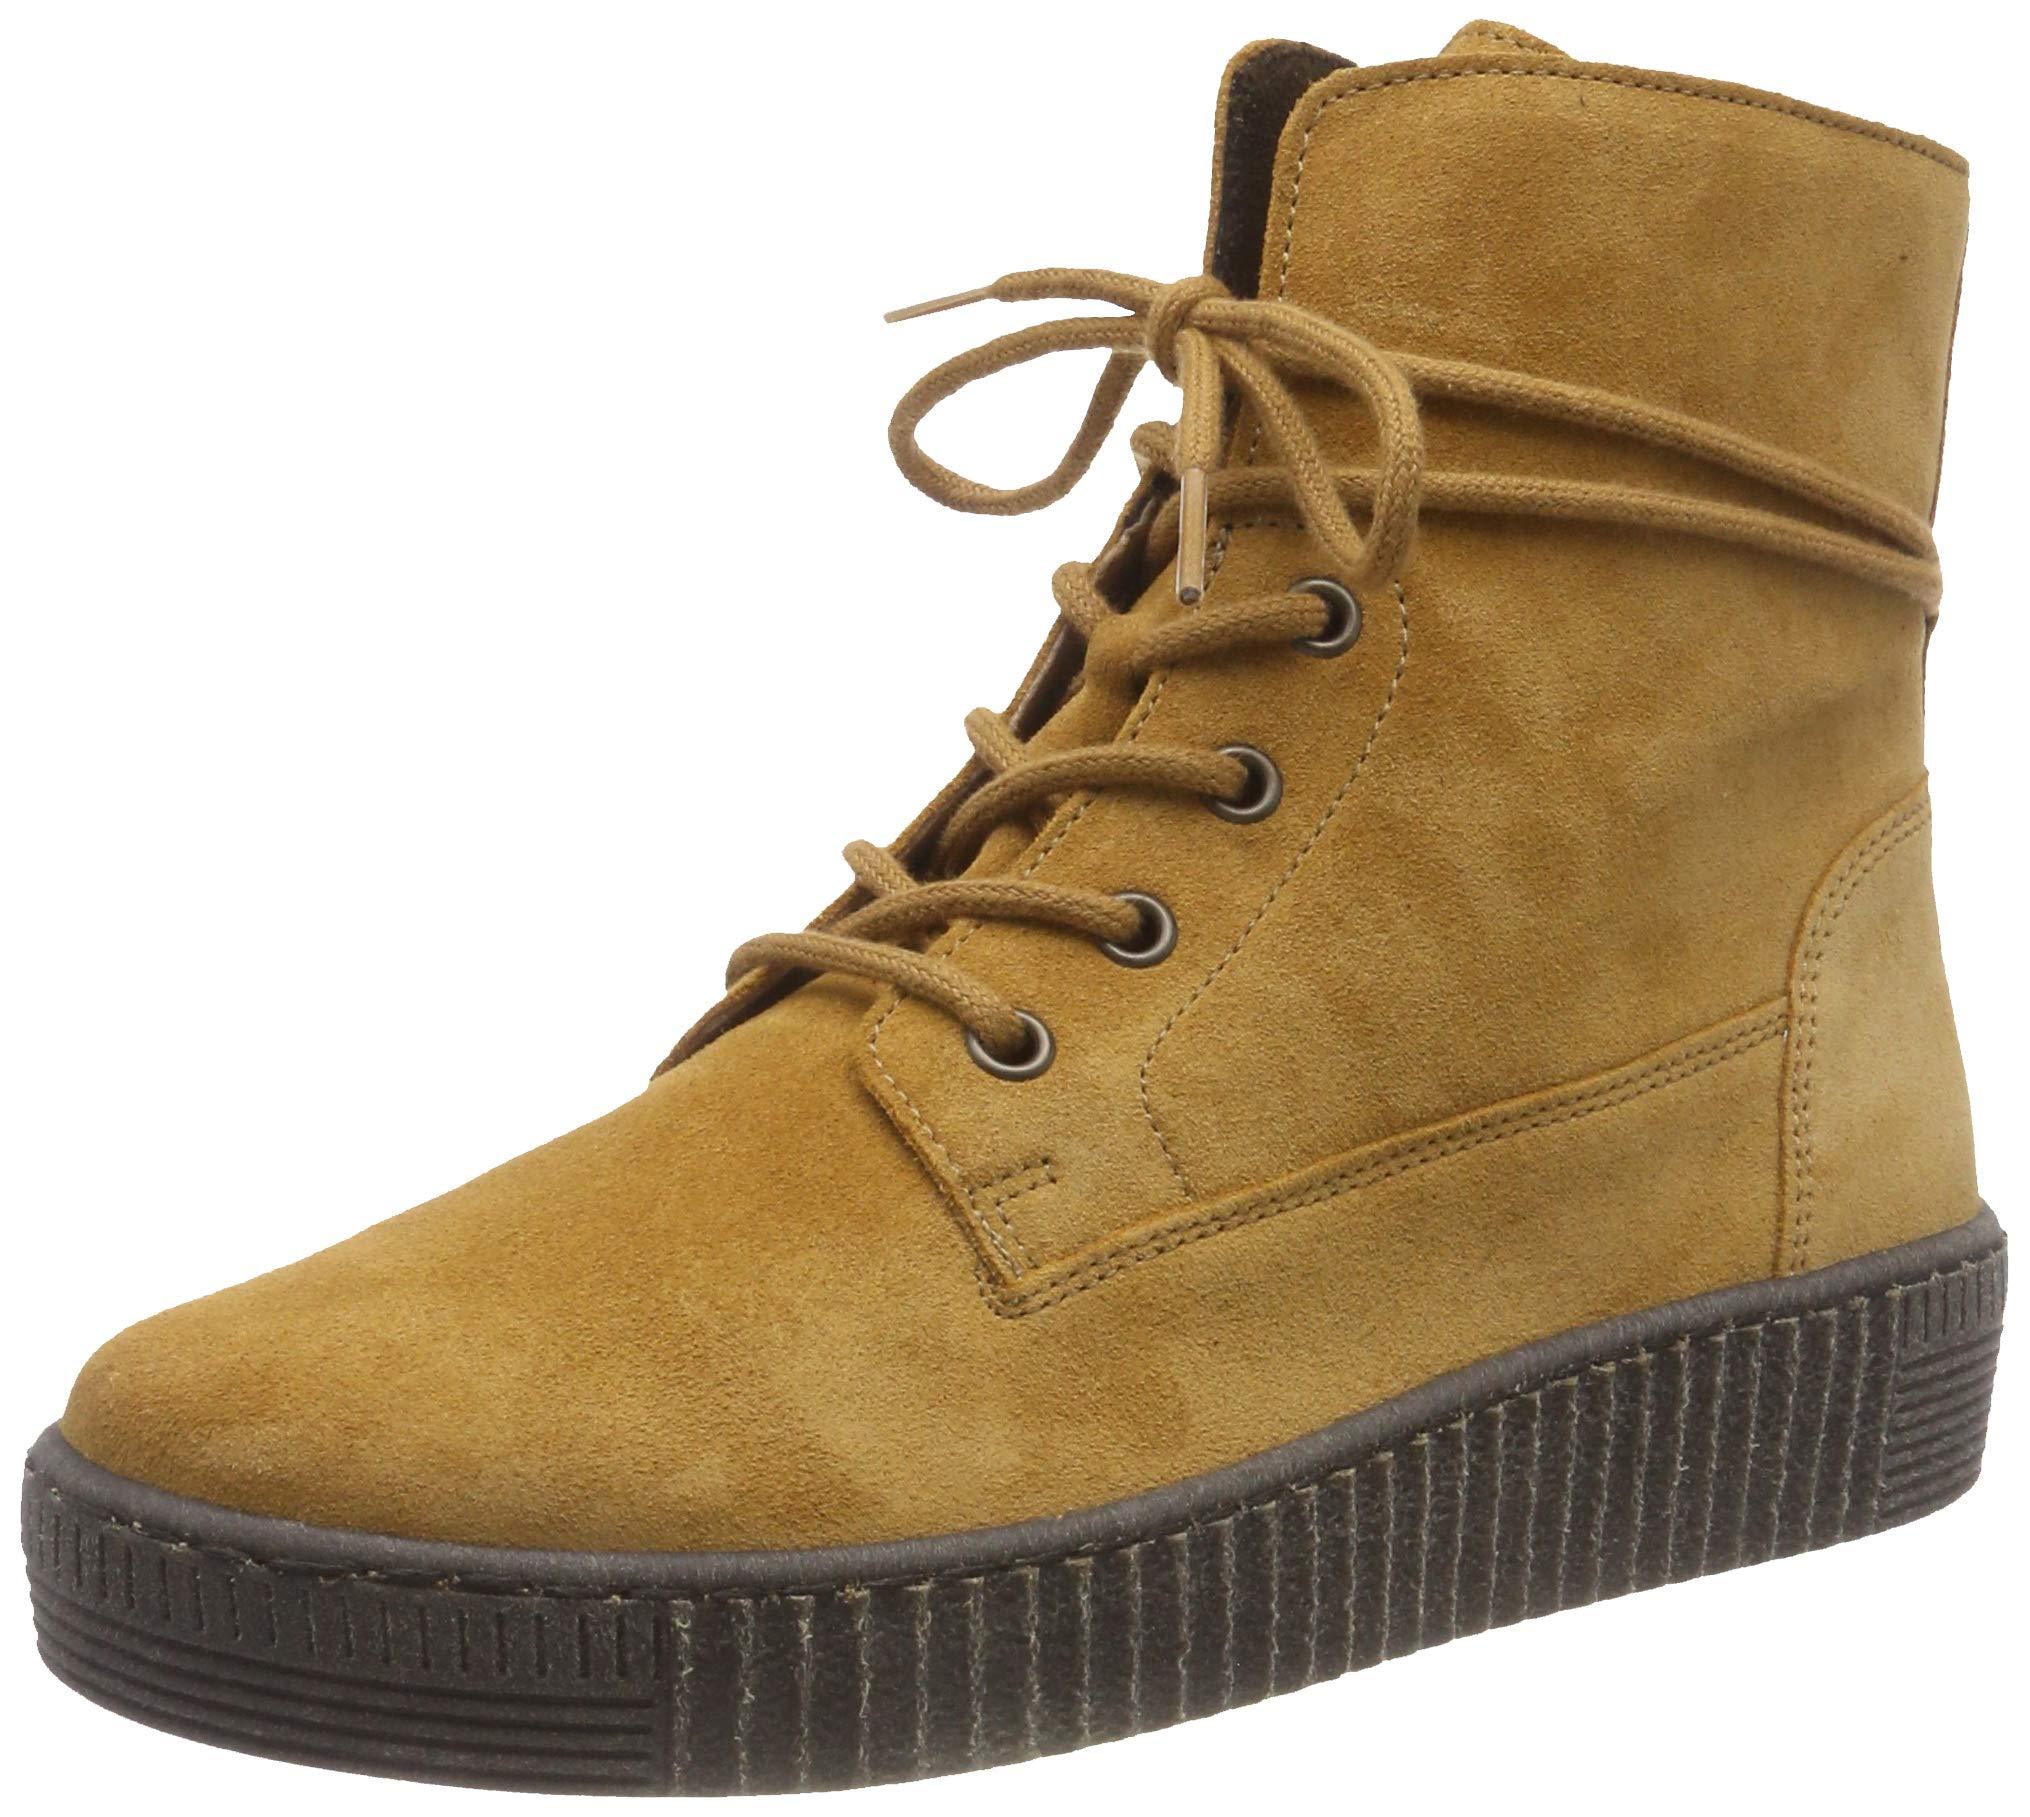 Eu FemmeMarronpeanutanthrazit1438 Gabor 5 Shoes JollysBotines UMVGqSLpz